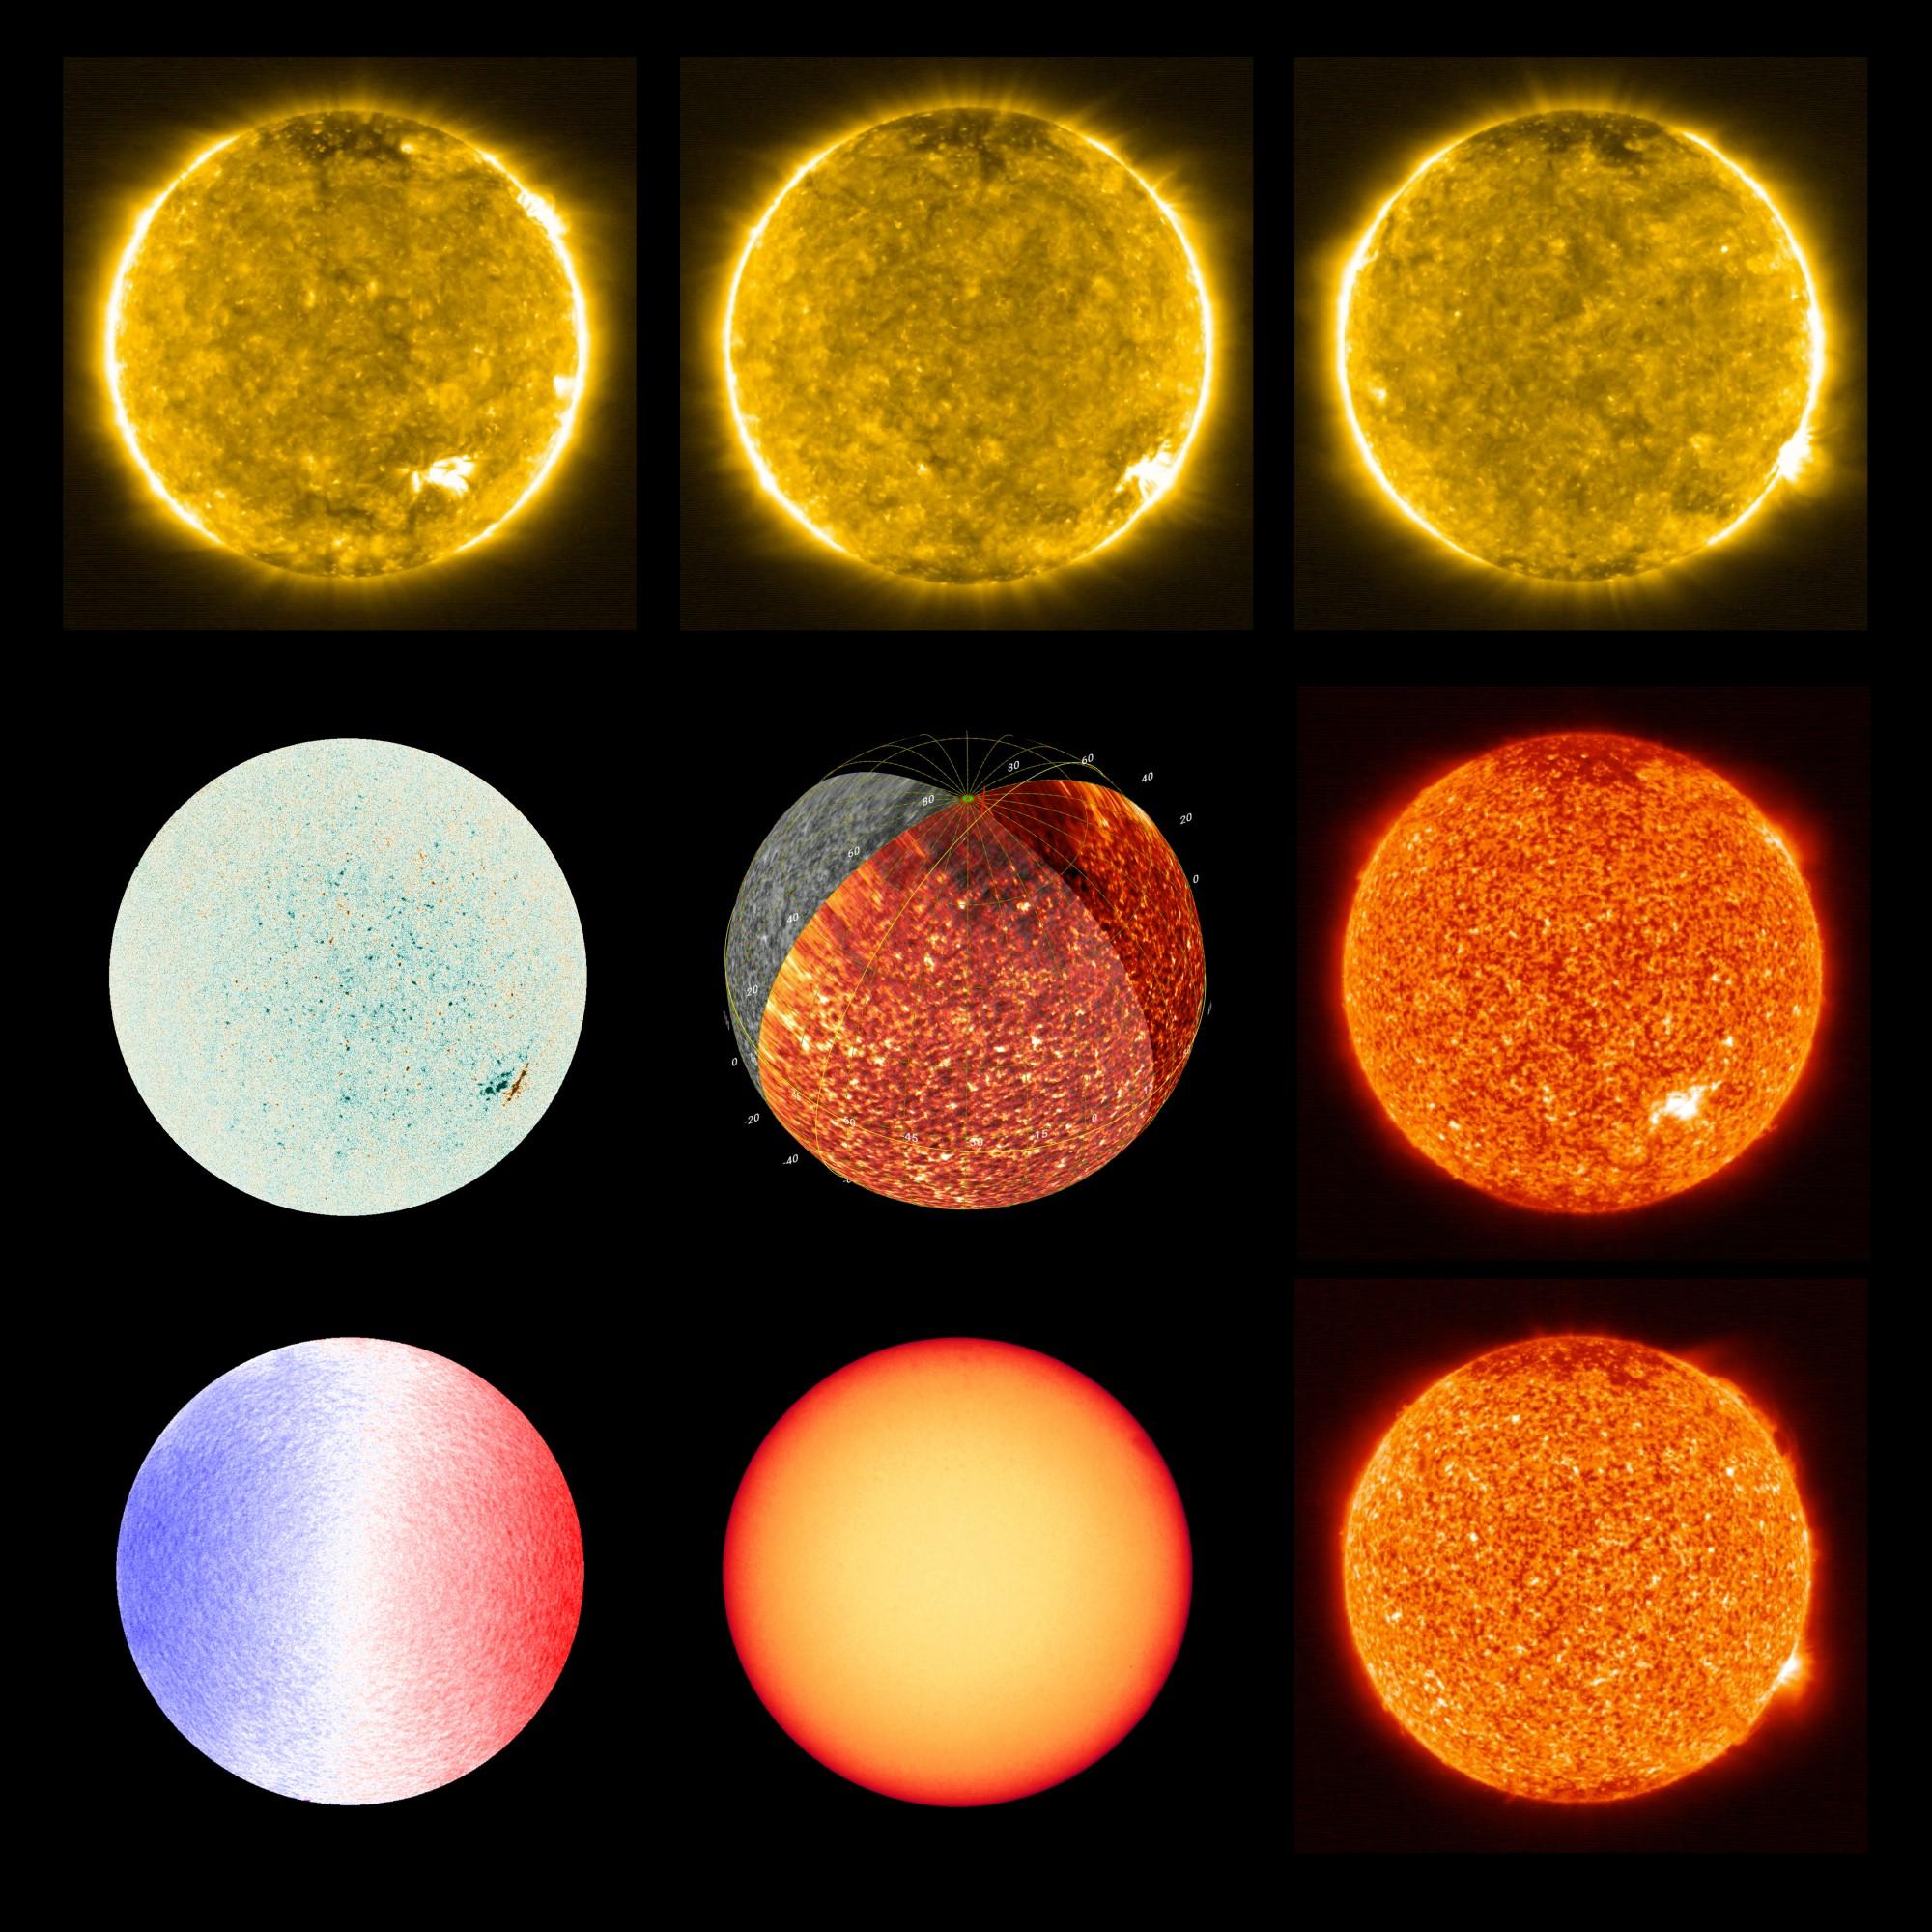 Sun at different wavelengths